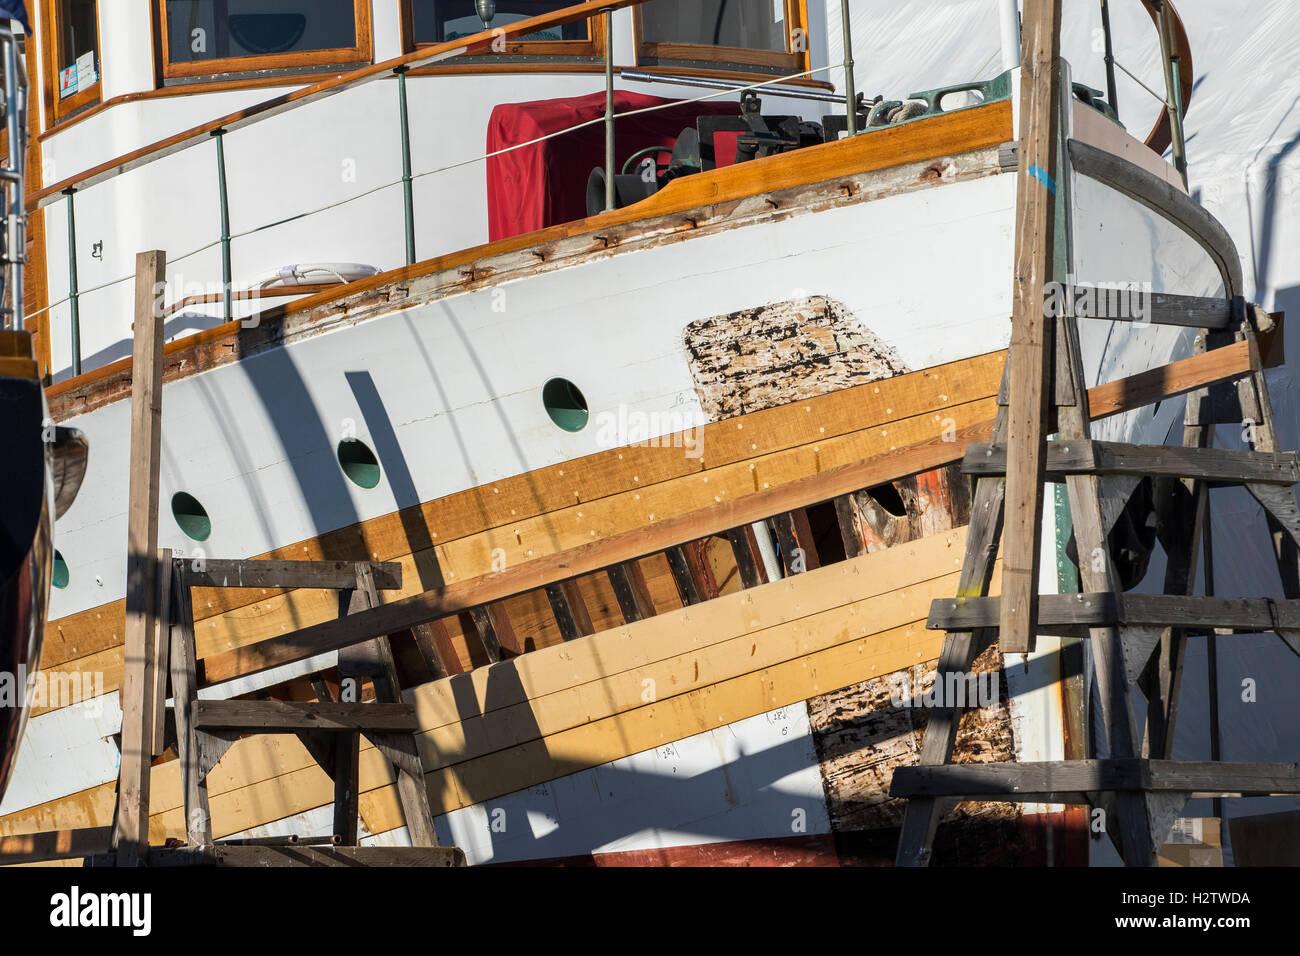 Reparación de barcos de madera en dique seco por shipwright en Port Townsend astillero. Foto de stock